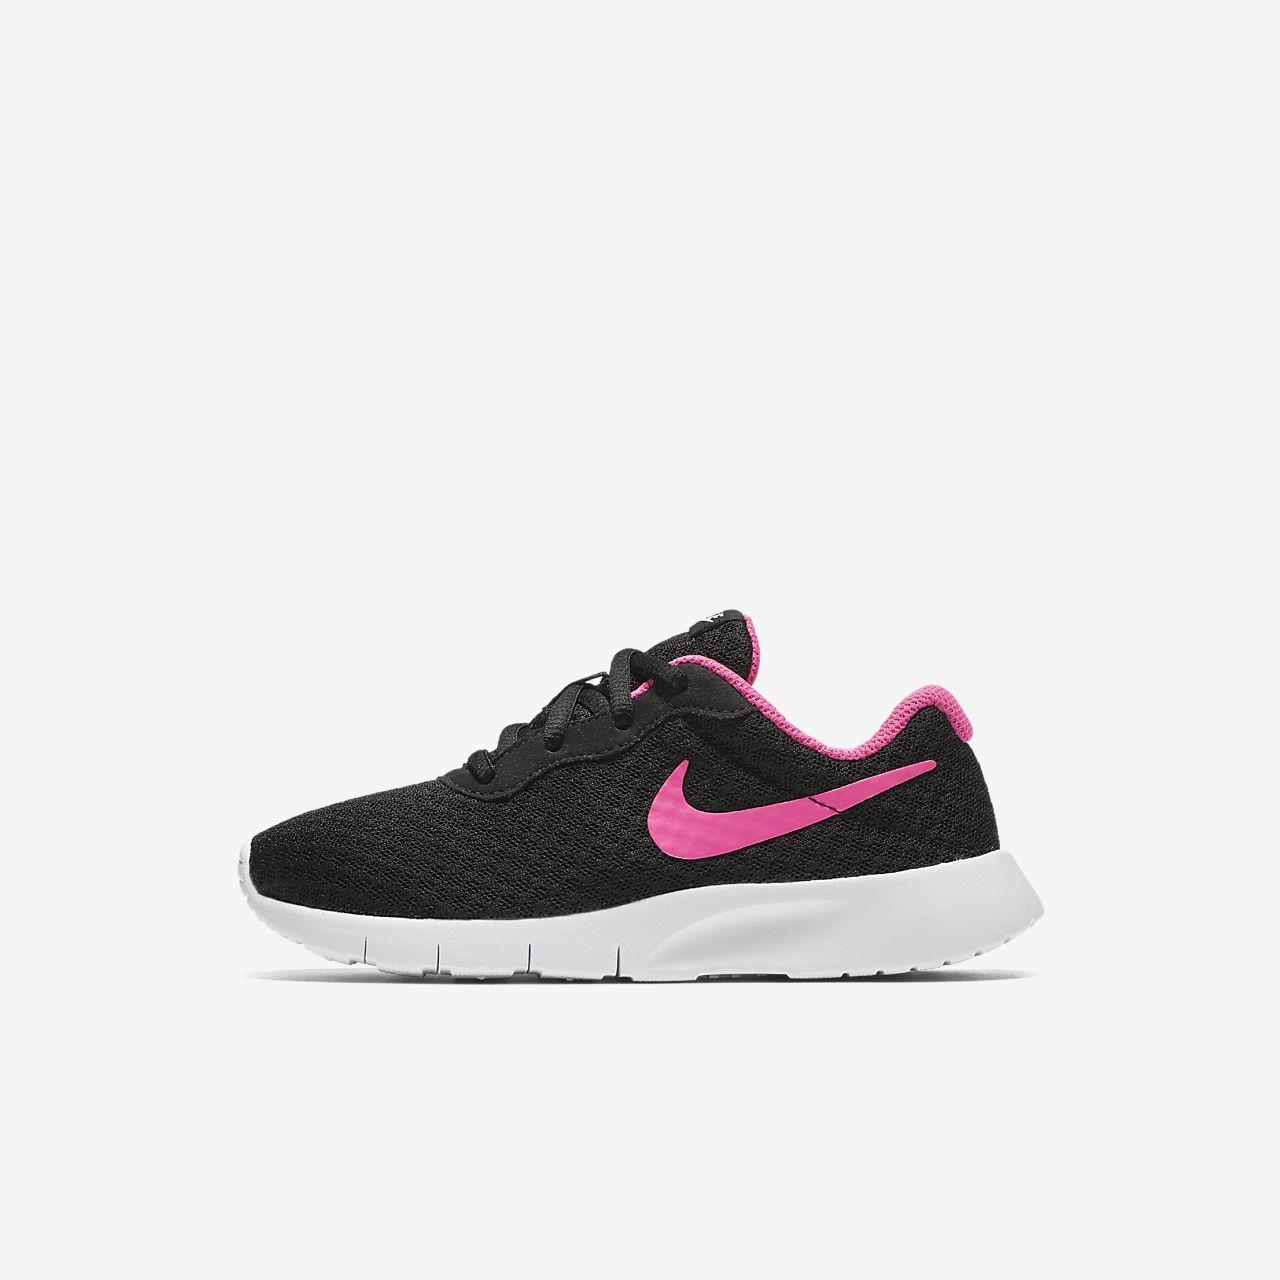 Nike Tanjun EnfantCa Jeune Chaussure Pour 13lJTuFcK